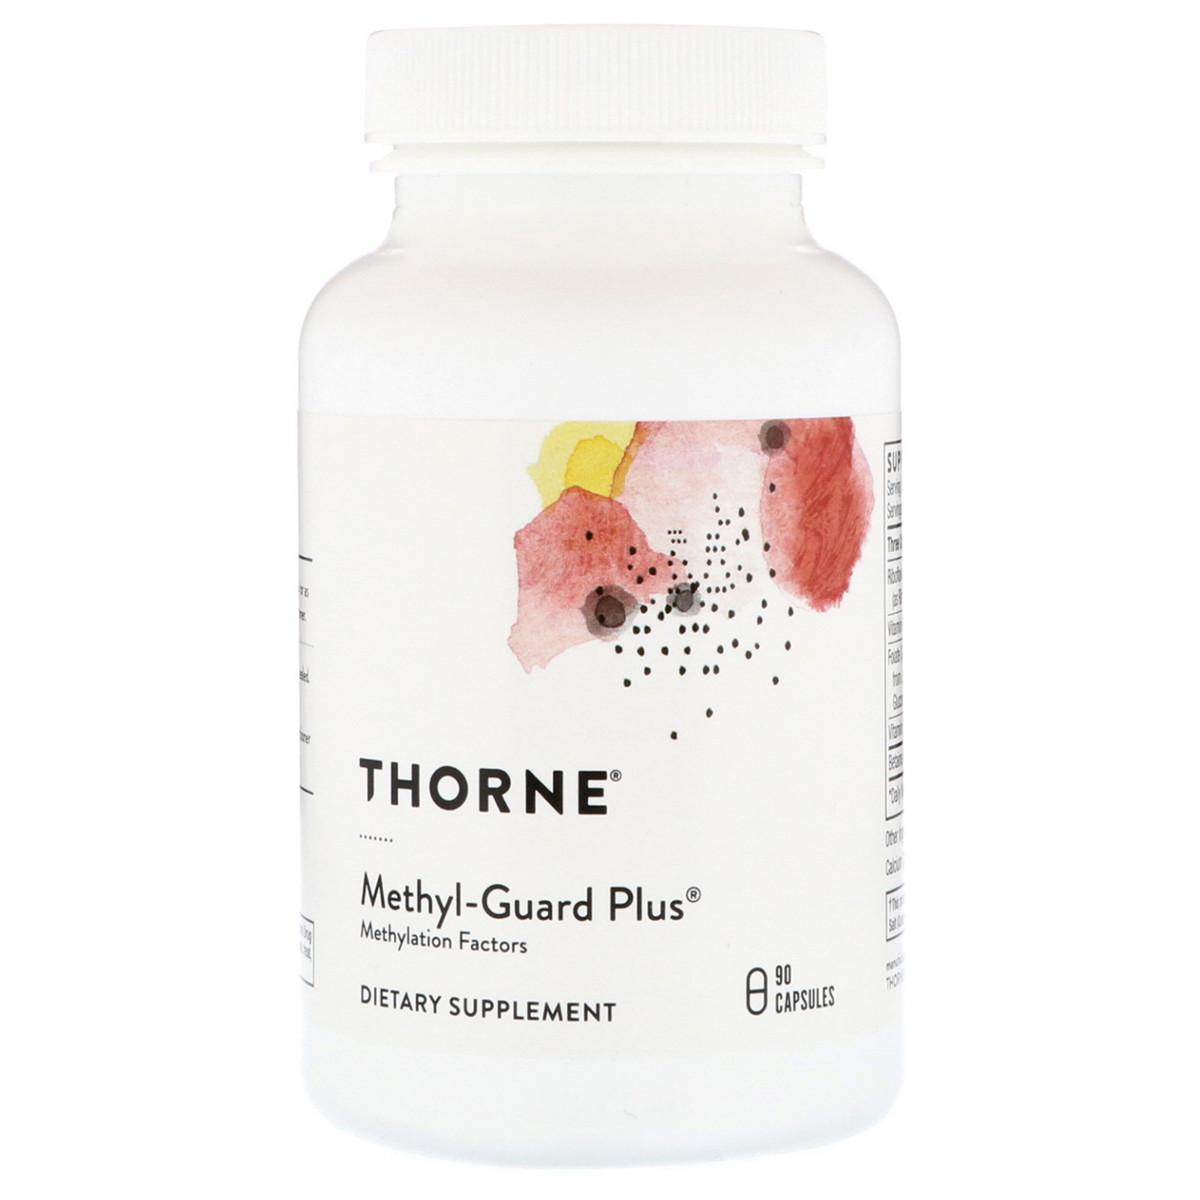 Метил-Гард, Витамины для Мозга, Methyl-Guard Plus, Thorne Research, 90 капсул